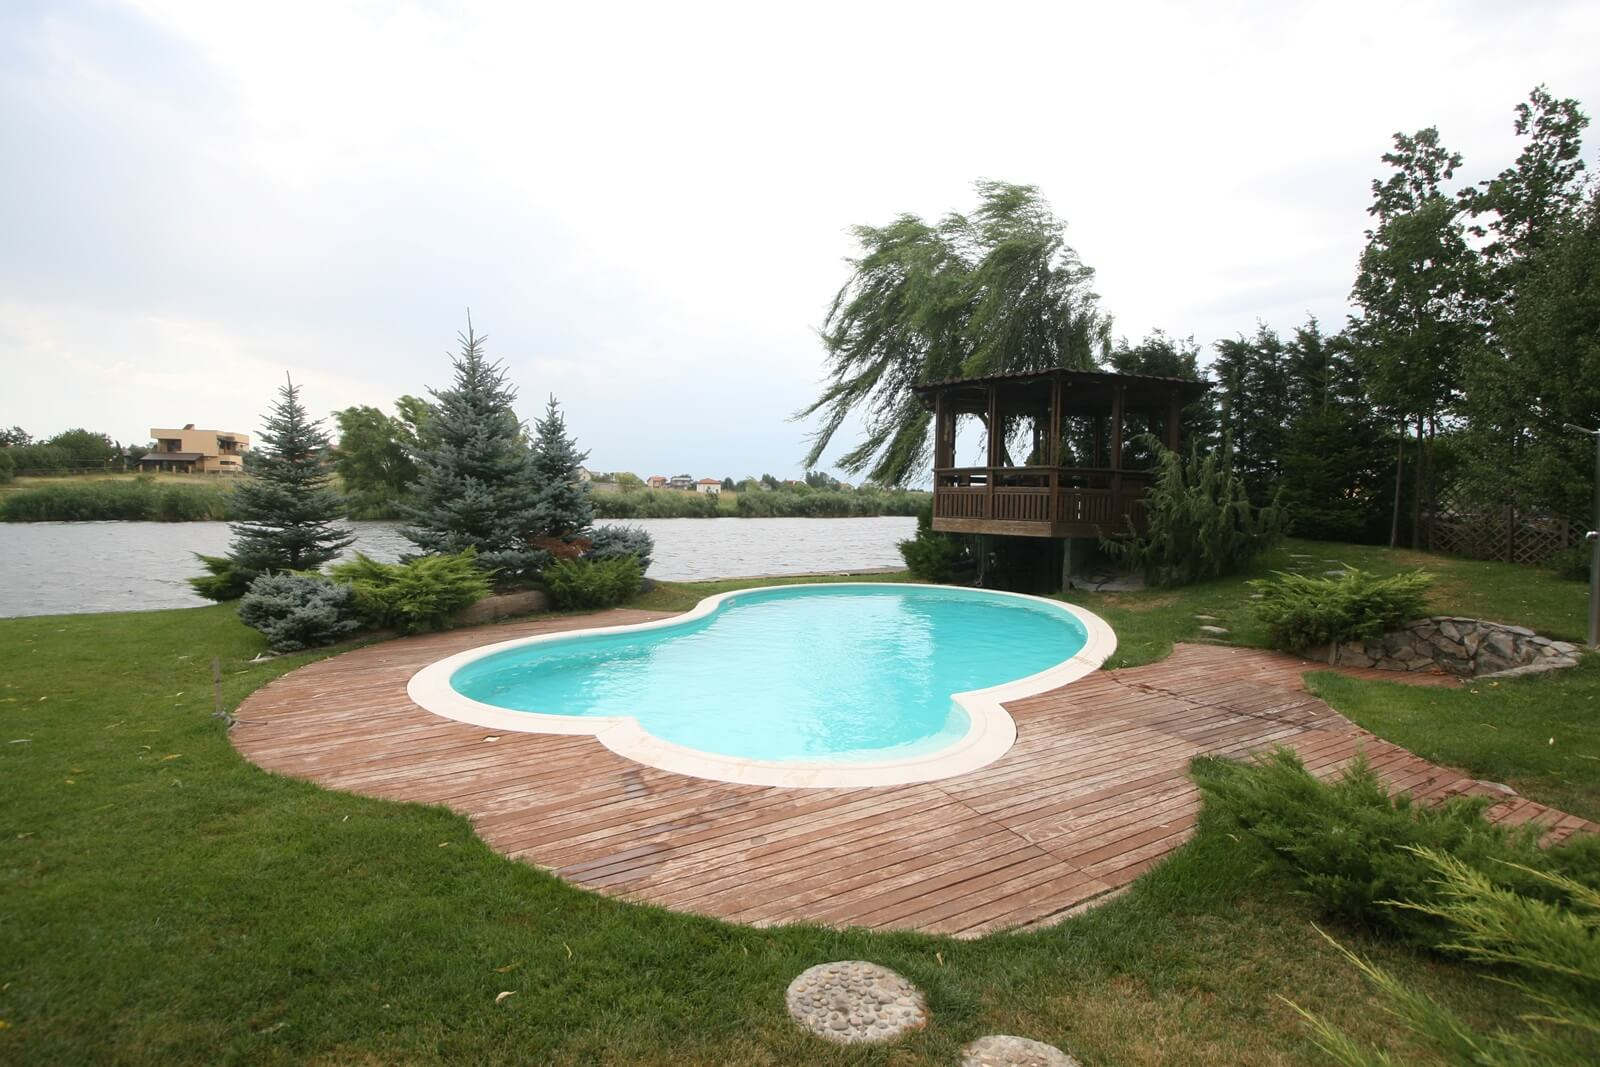 Piscine din beton tot ce trebuie sa stii for Constructie piscine